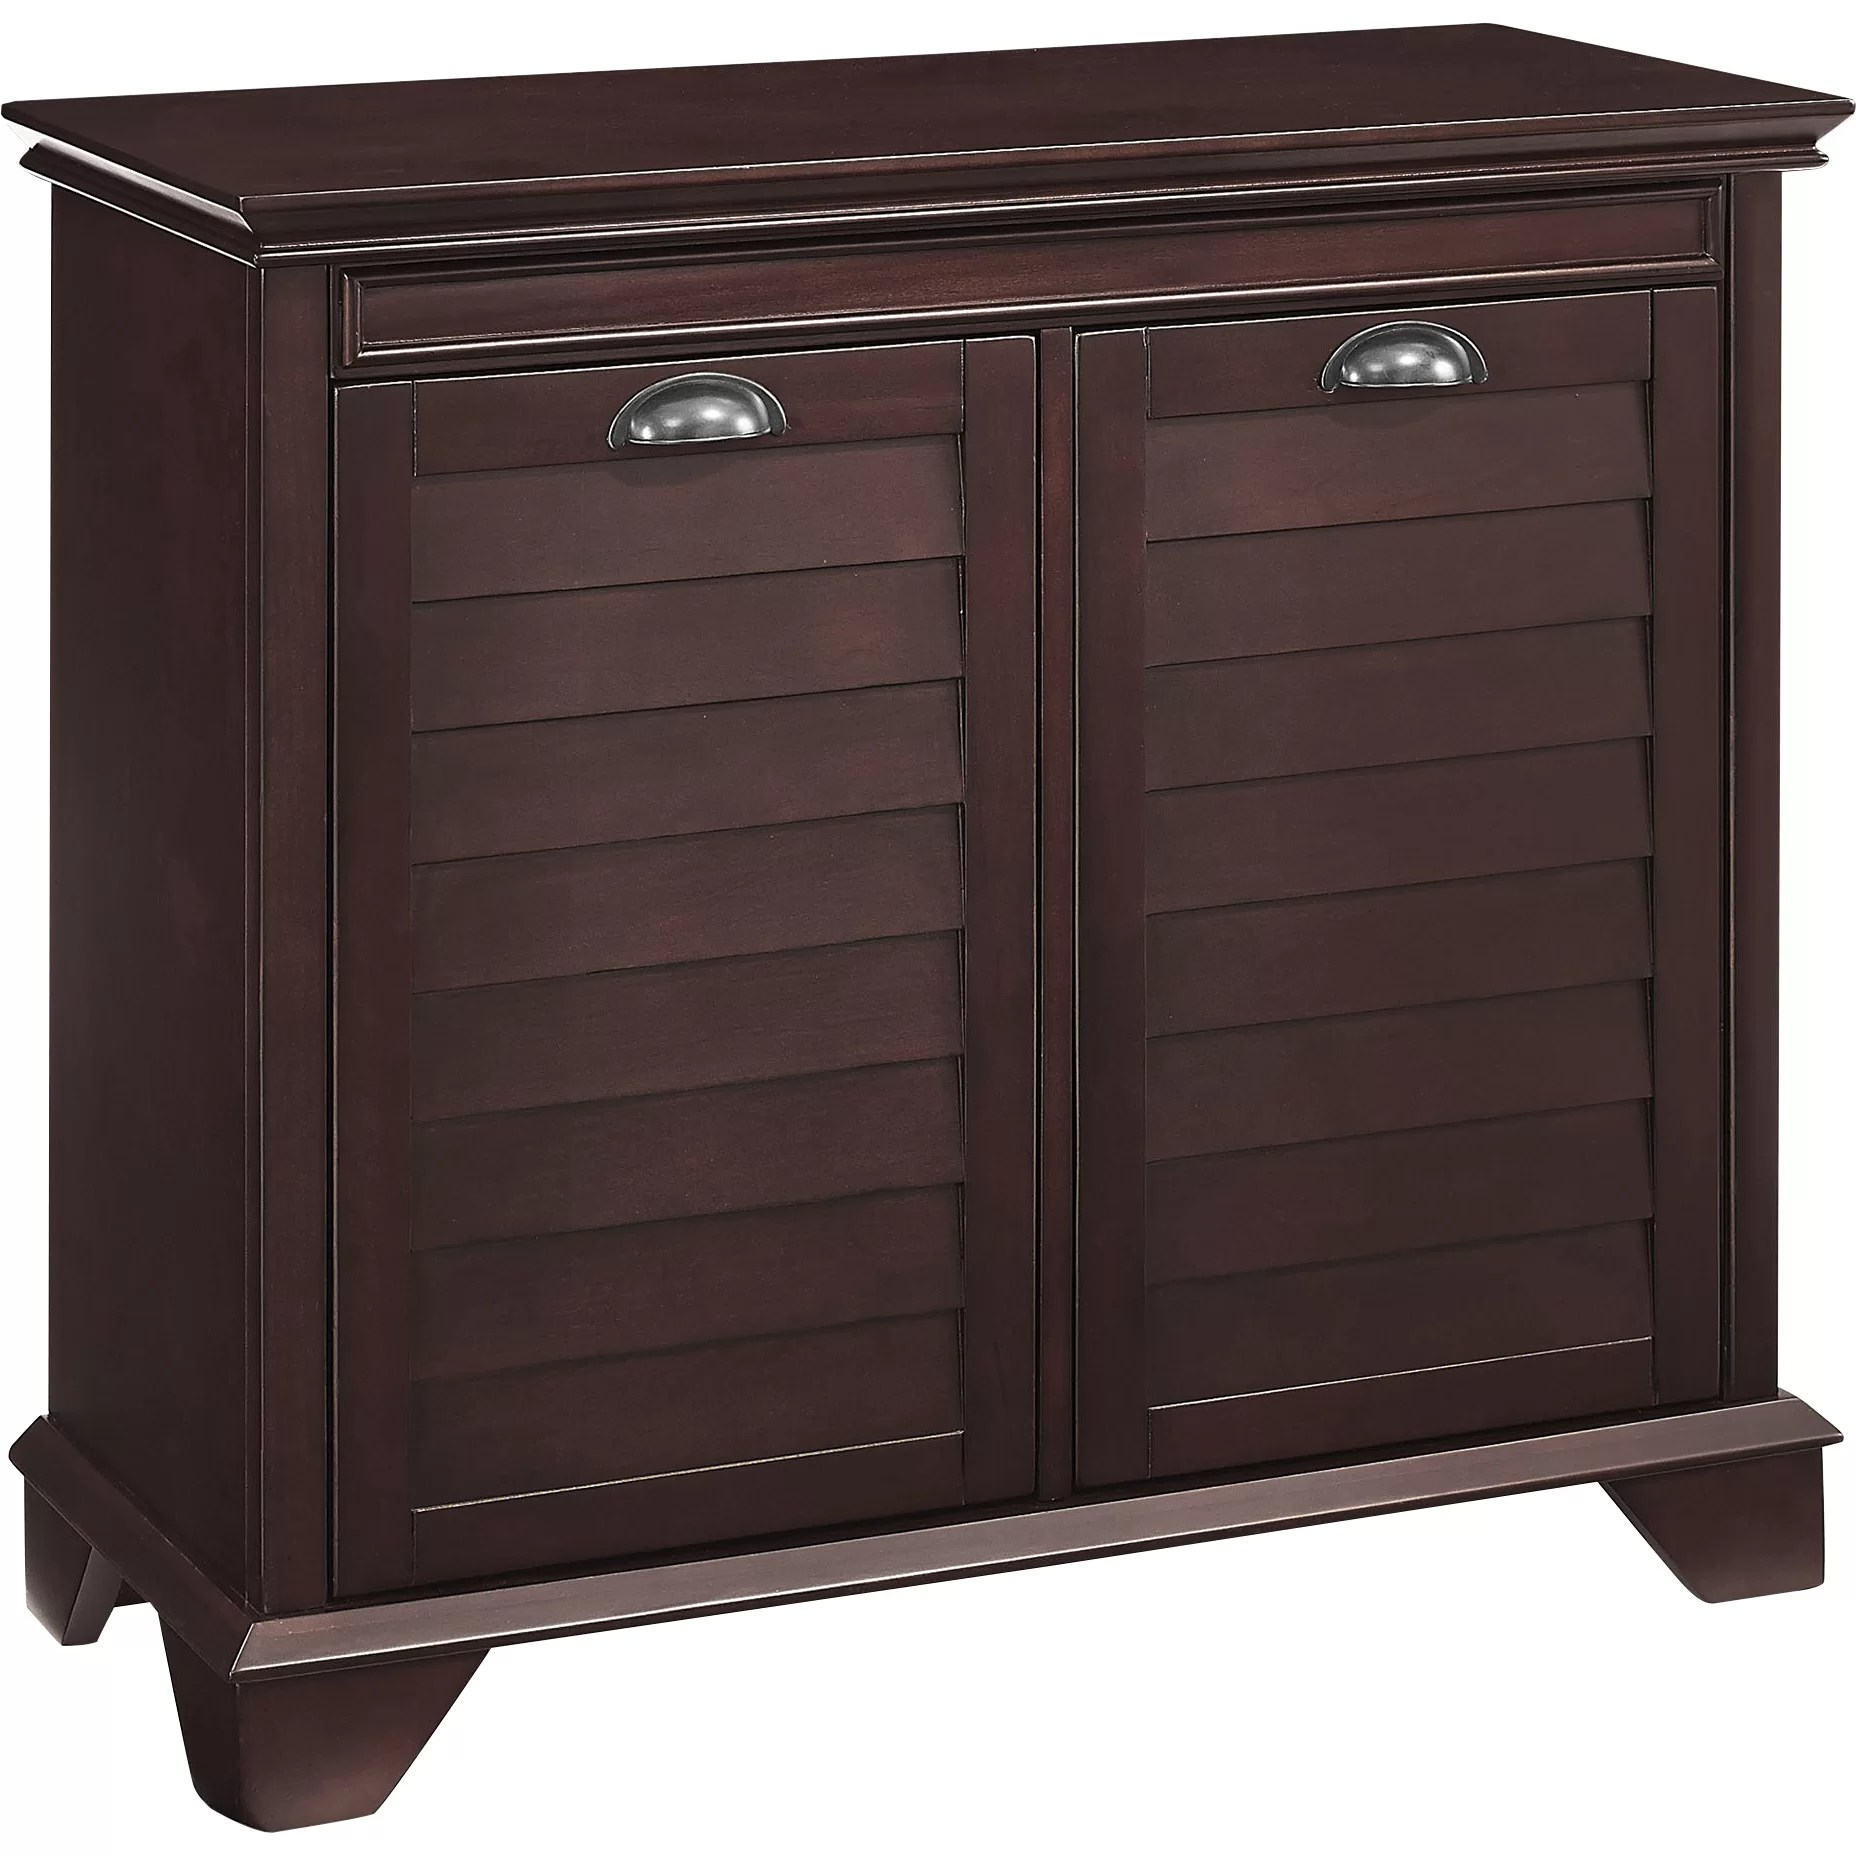 Beachcrest Home Martel Cabinet Laundry Hamper  Reviews  Wayfair